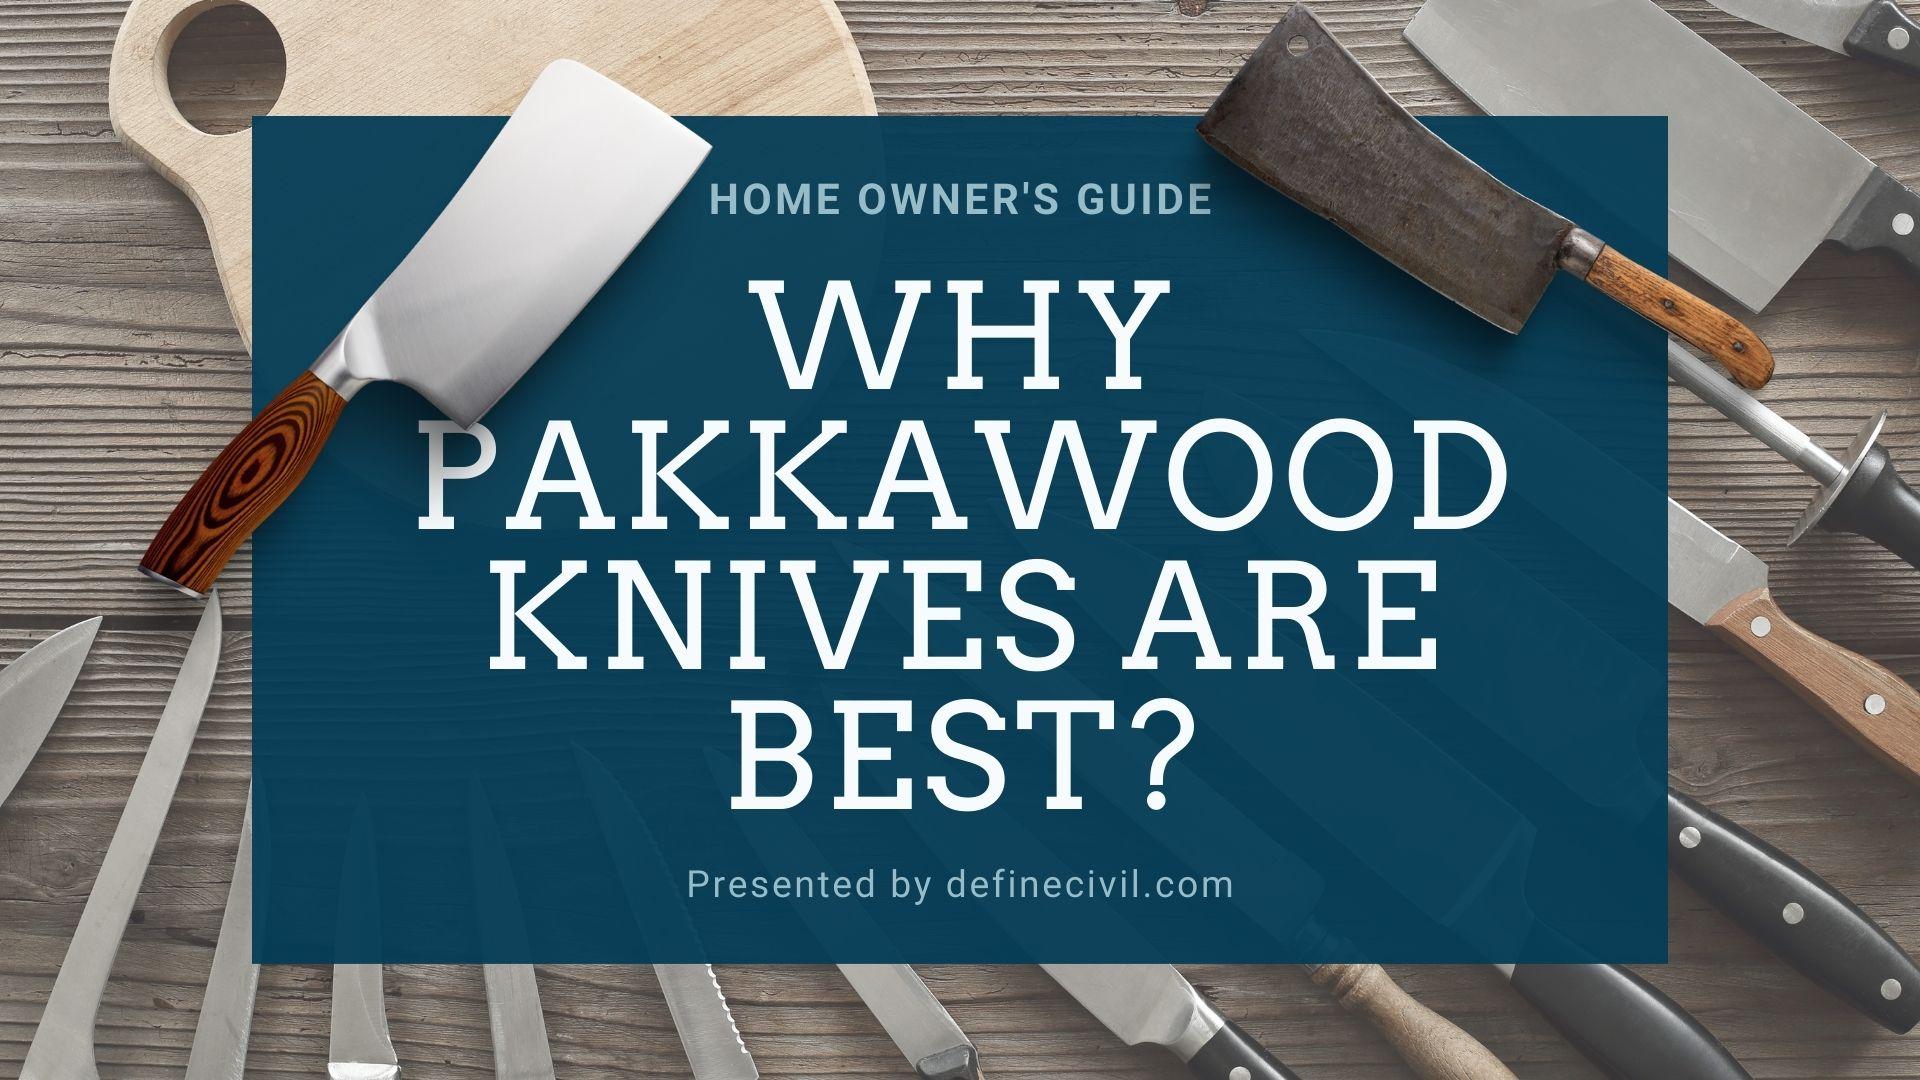 What is Pakkawood?